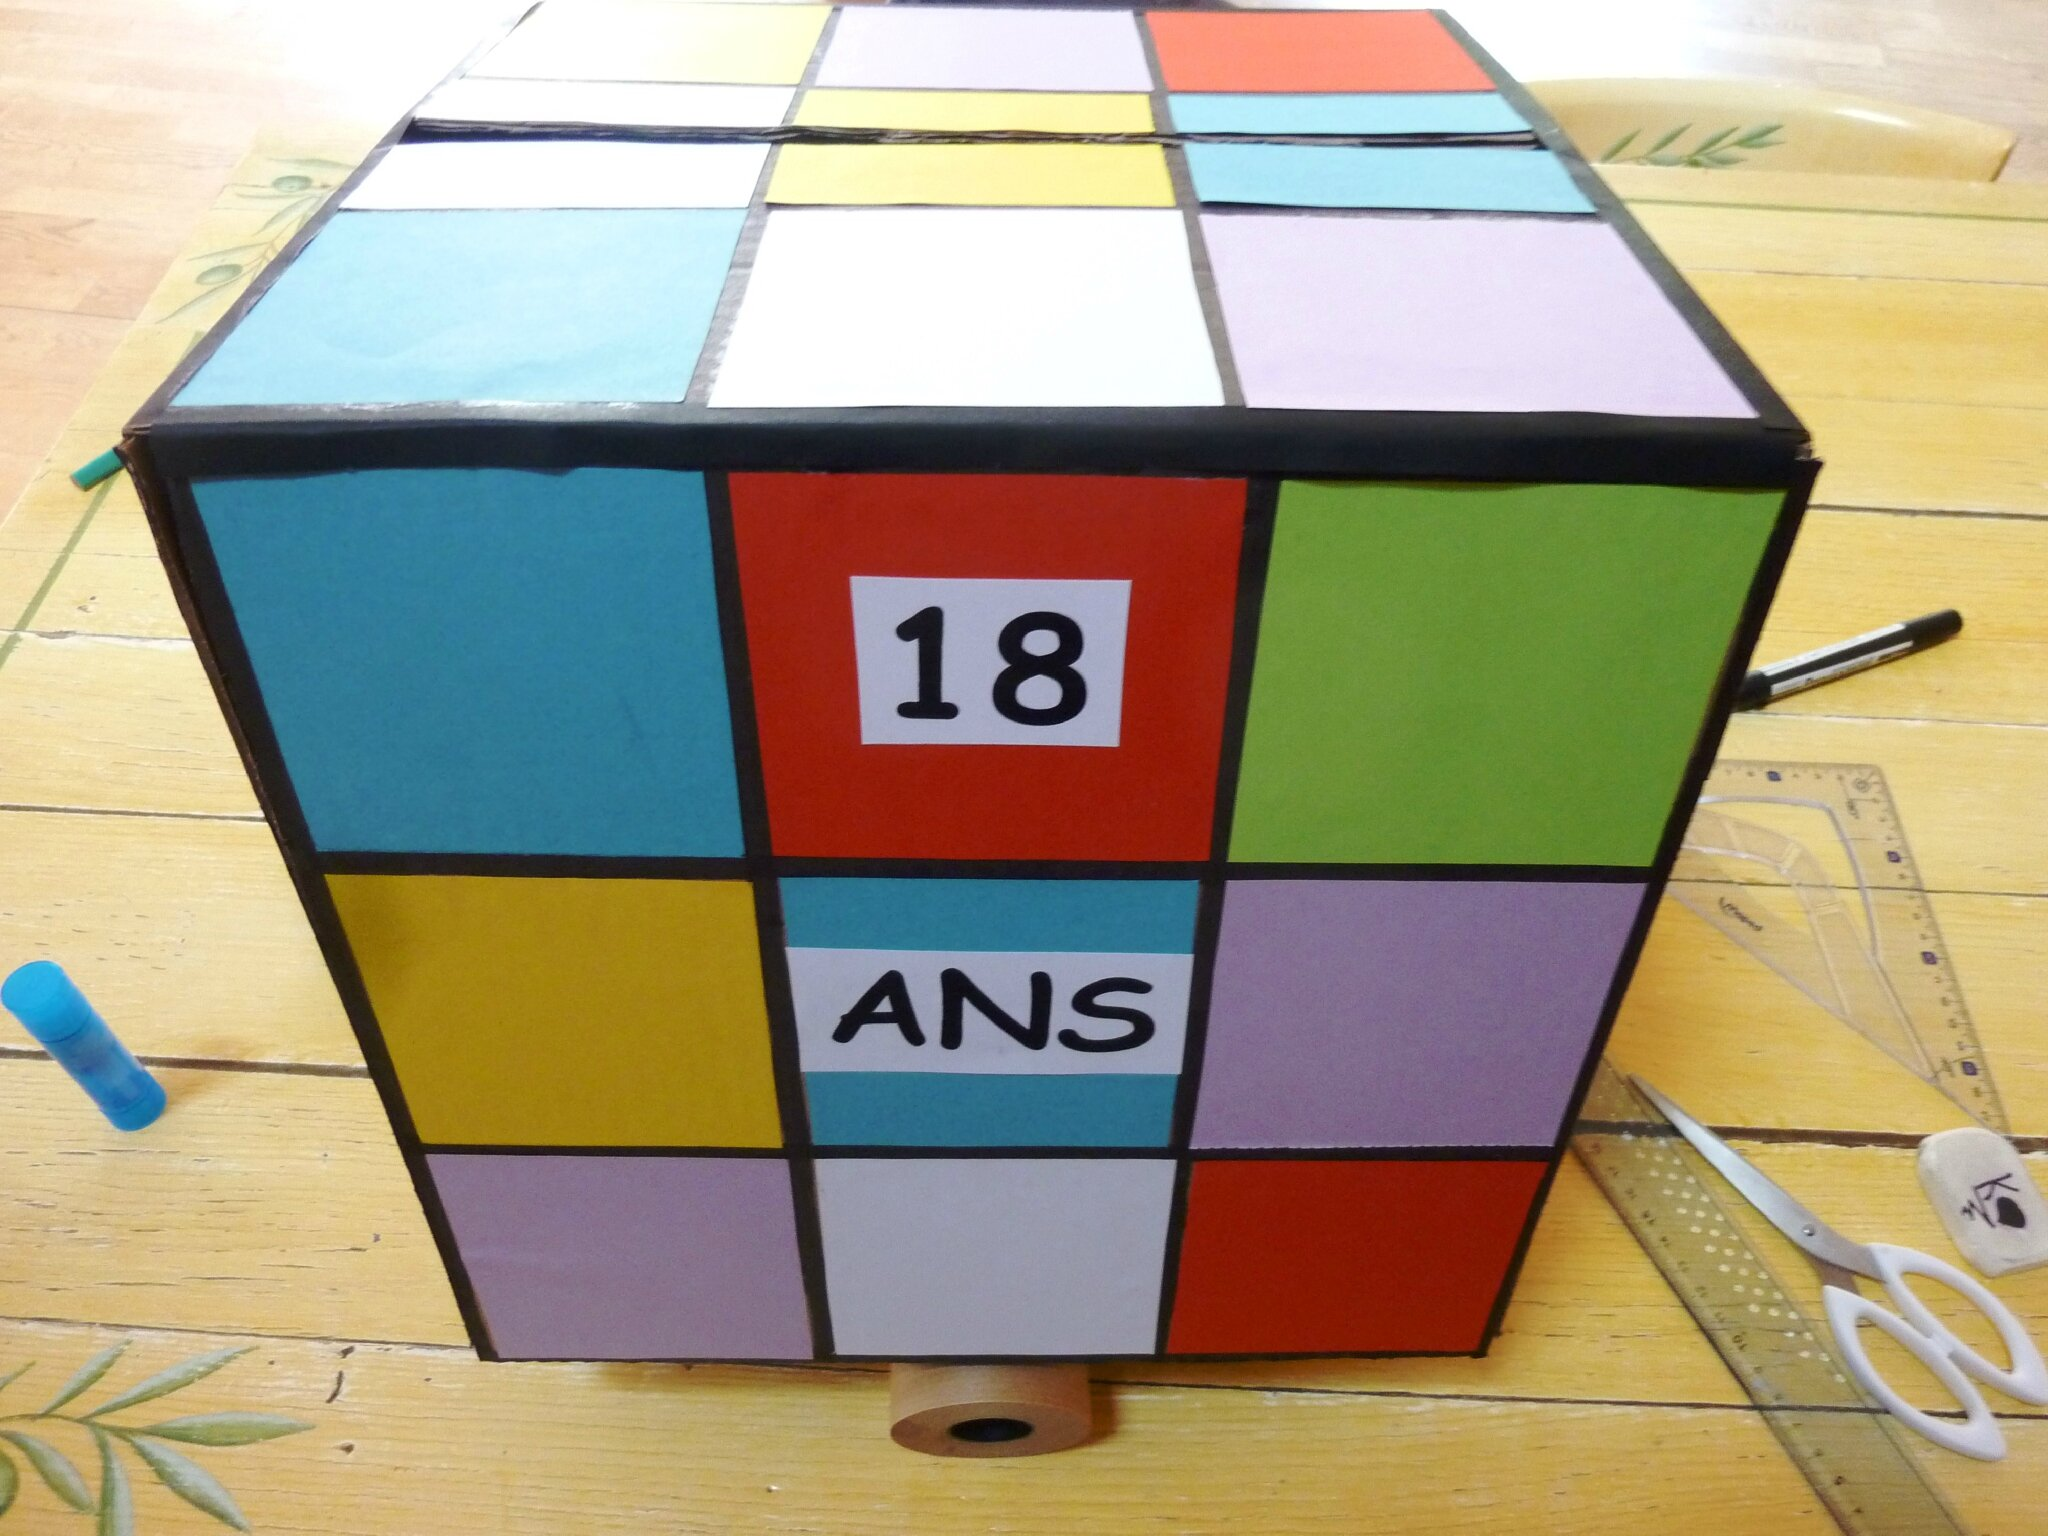 Tuto Urne Danniversaire Facon Rubiks Cube DIY